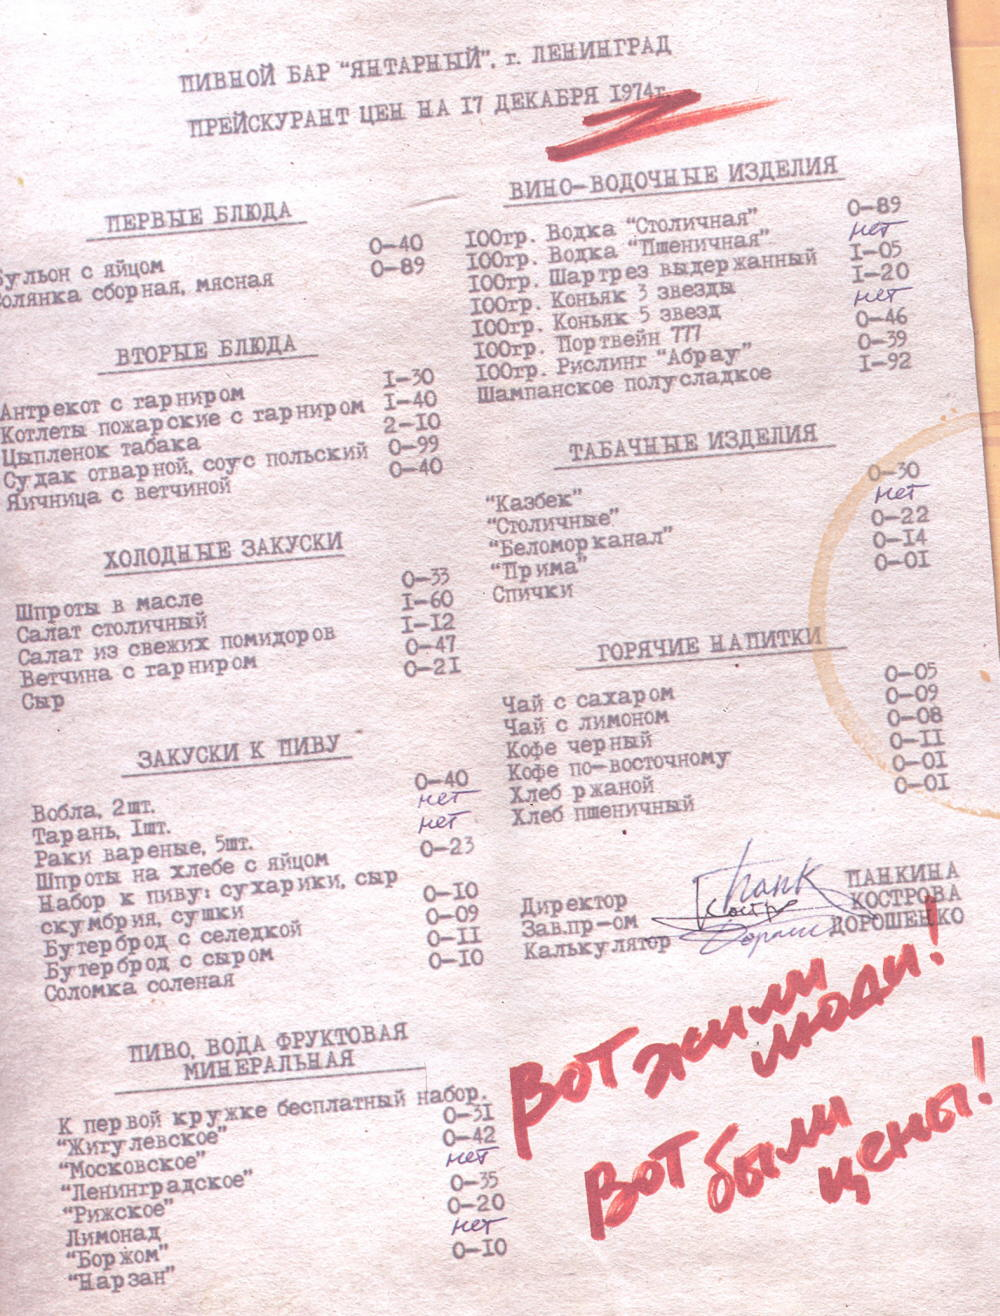 Пивной бар Янтарный. г.Ленинград. Прейскурант цен на 17 декабря 1974 года.